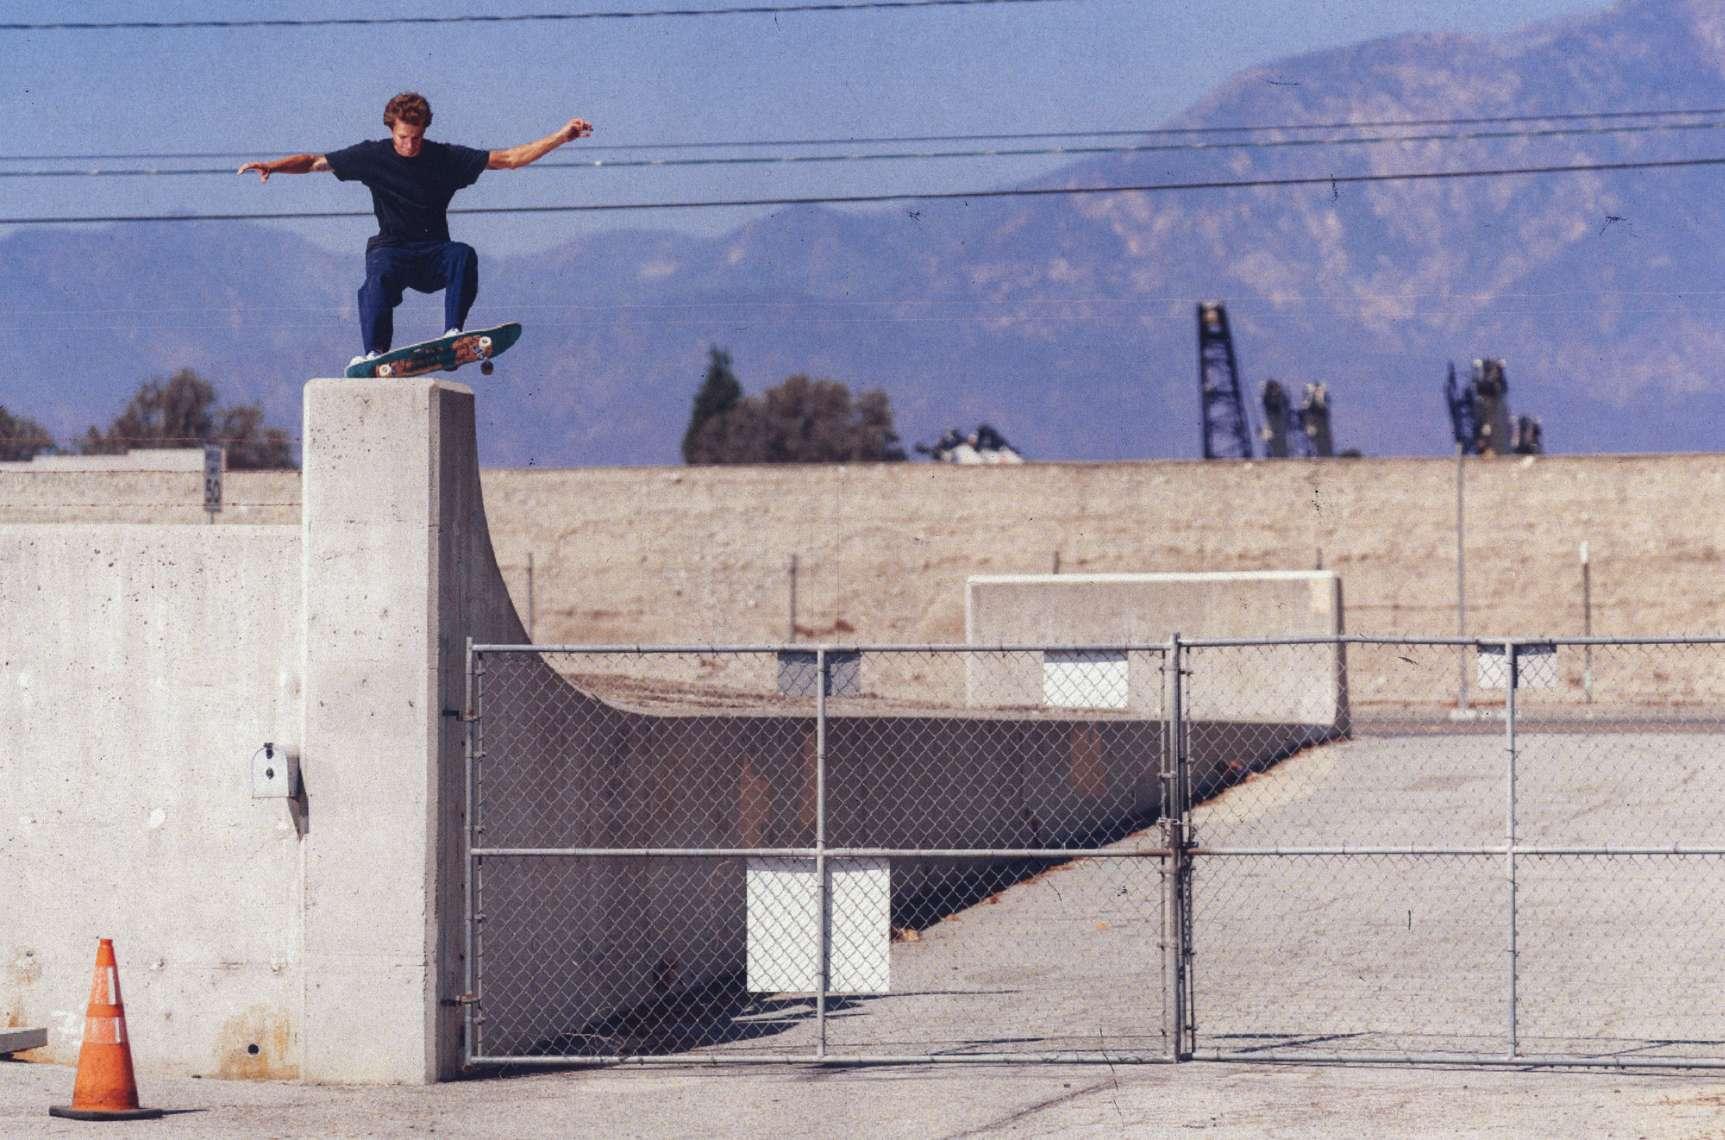 Axel Cruysberghs x Skate Sk8-Hi